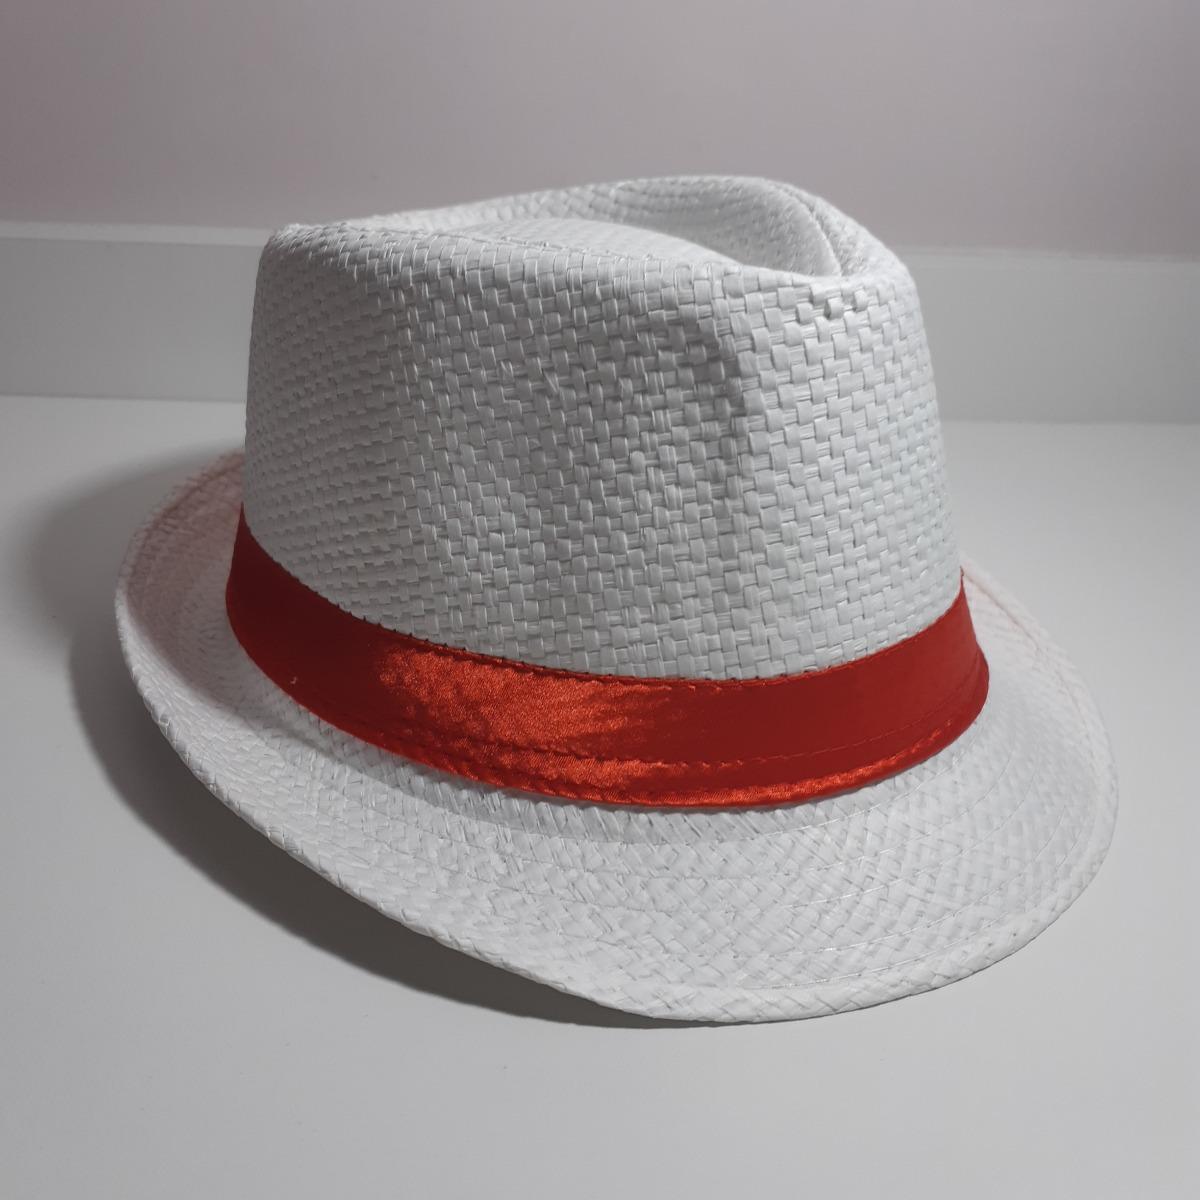 chapéu zé pilintra malandro exu umbanda quimbanda candomblé. Carregando  zoom. 4a3cf7d8de5